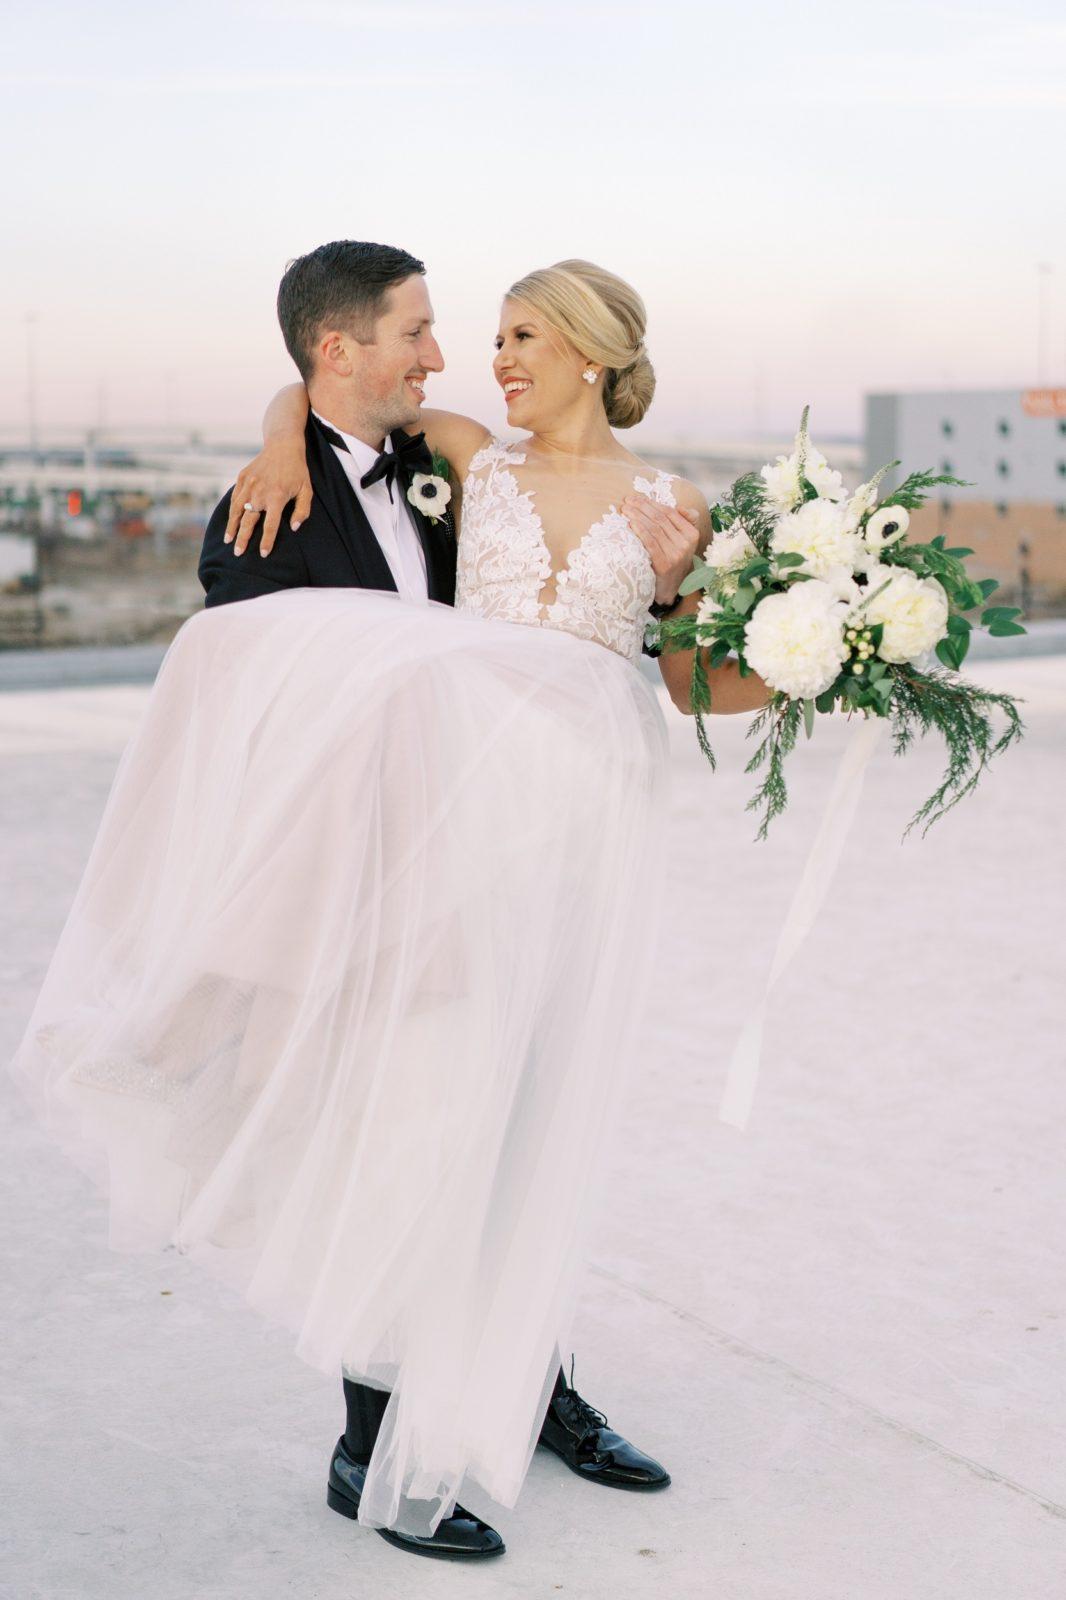 Monica Alberty Wedding Photography featured on Alexa Kay Events